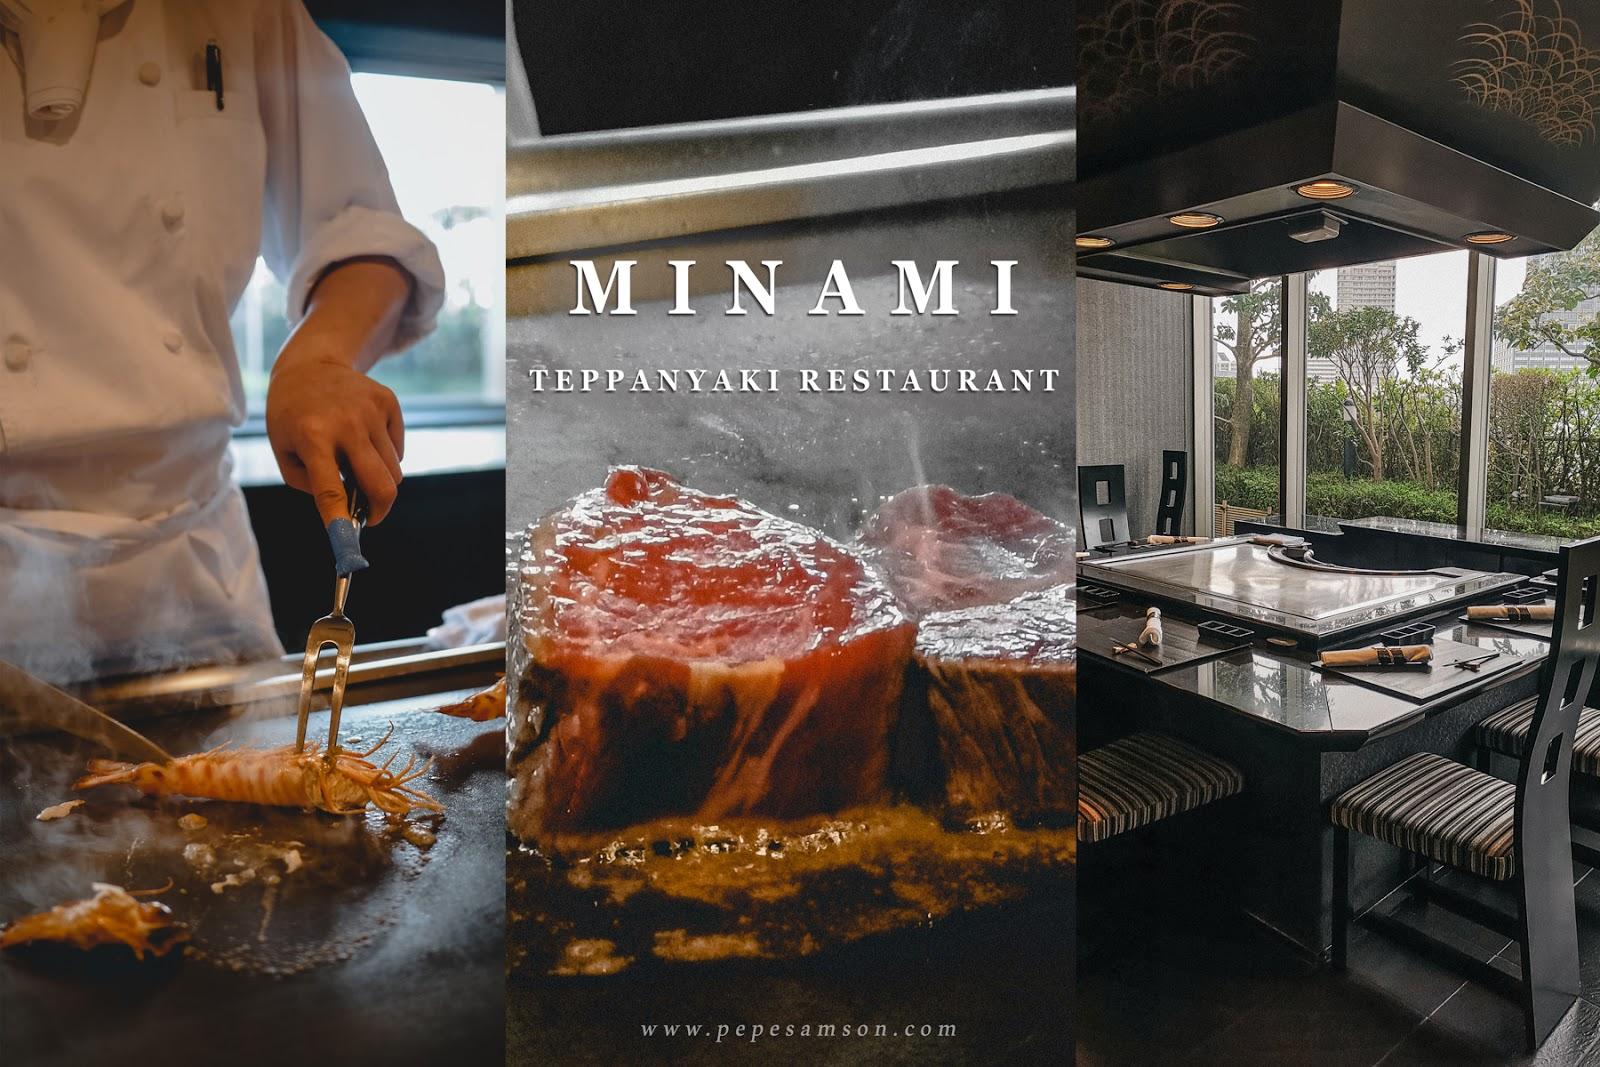 Treat Yourself to an Indulgent Teppanyaki Meal at Minami, Swissôtel Nankai Osaka